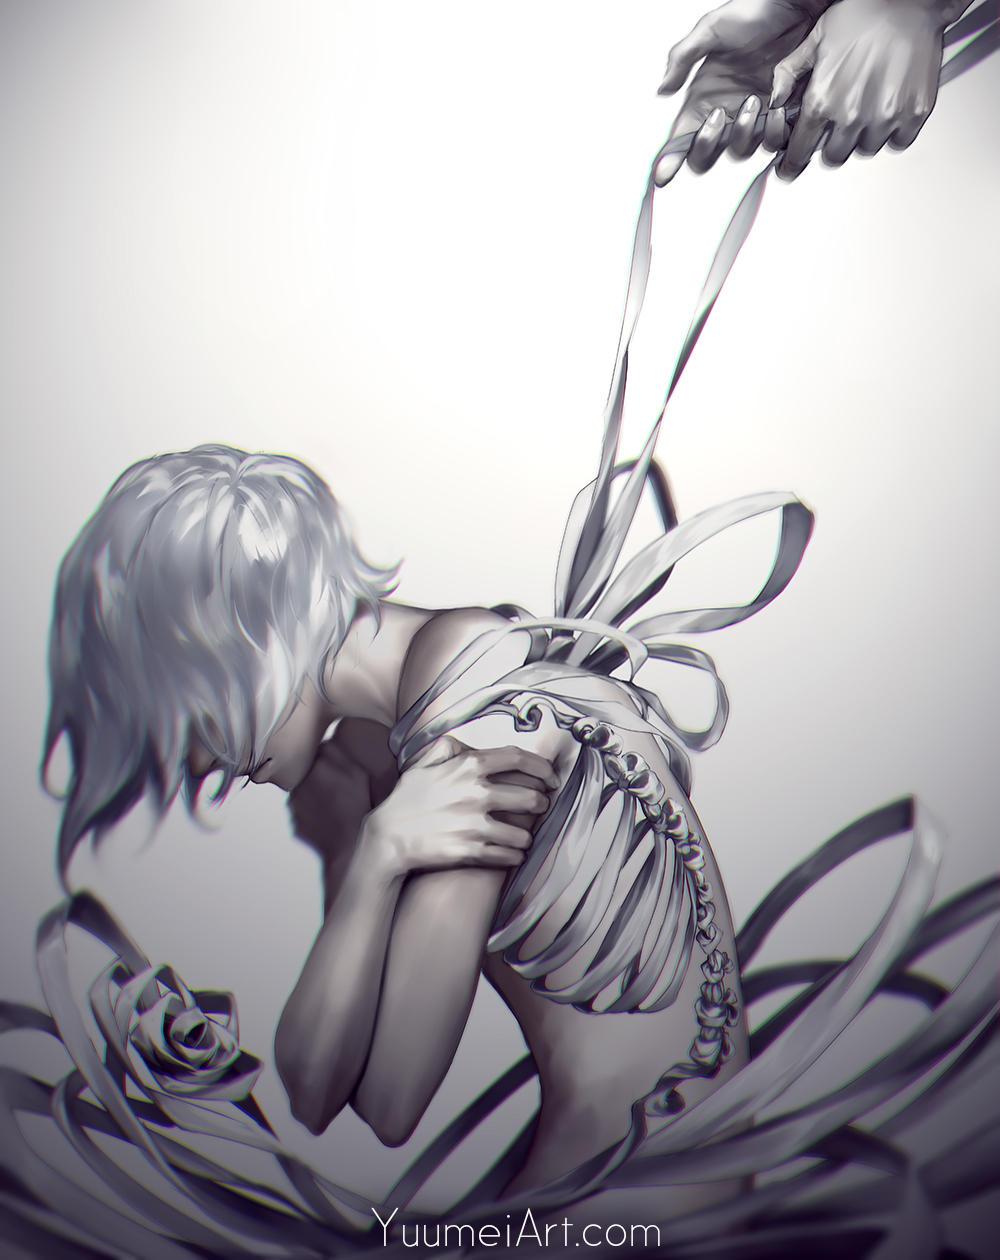 Come Undone by yuumei